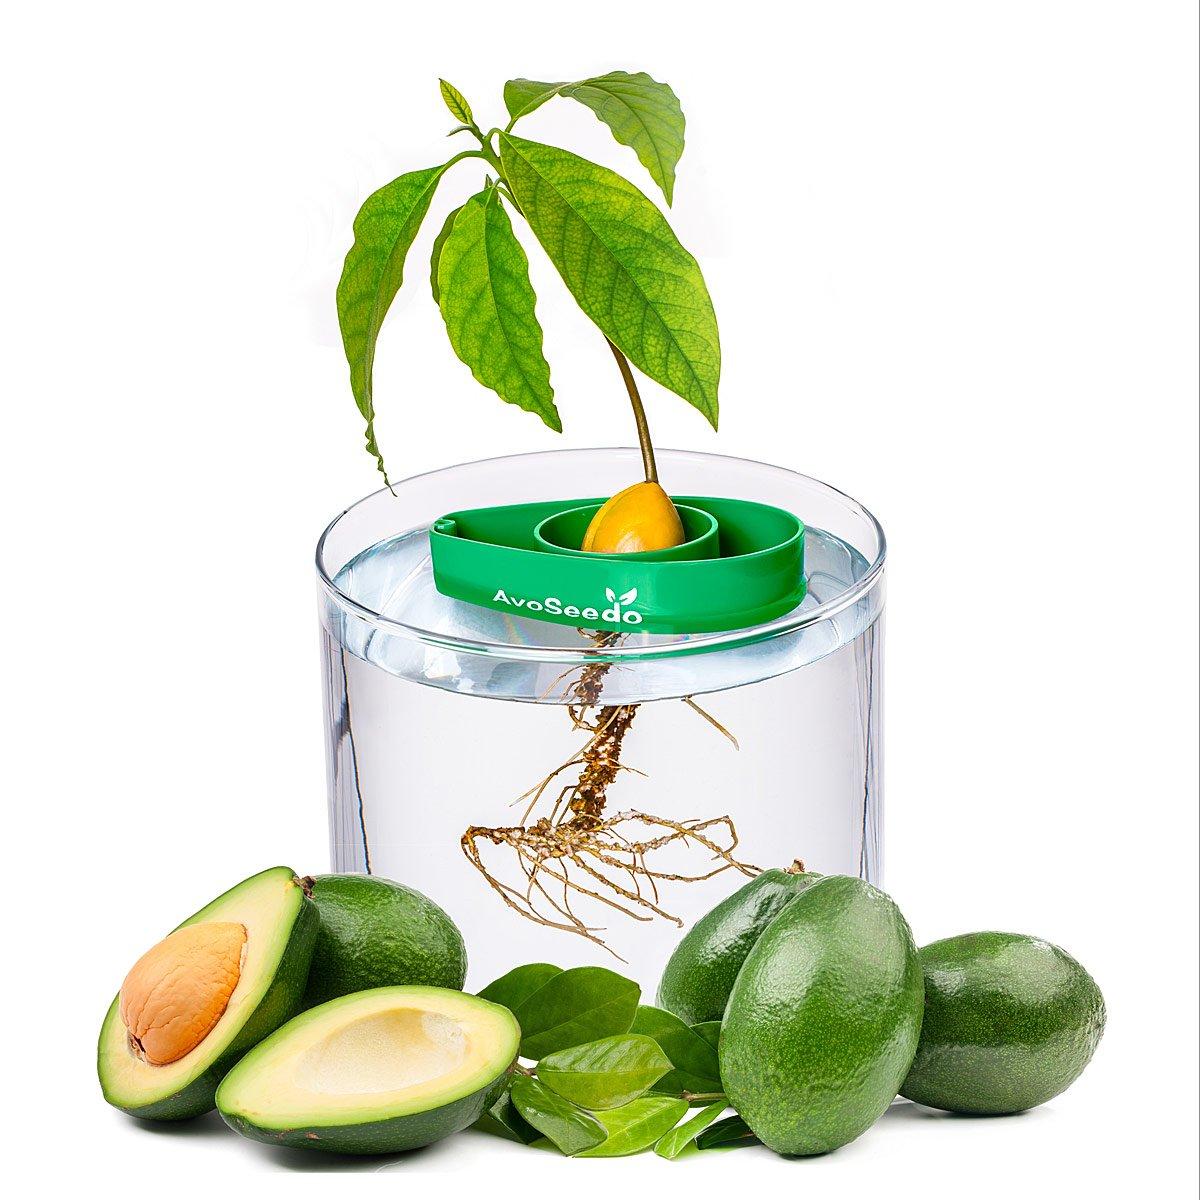 Avocado Tree Starter Kit Set Of 3 Grow Your Own Avocado Tree